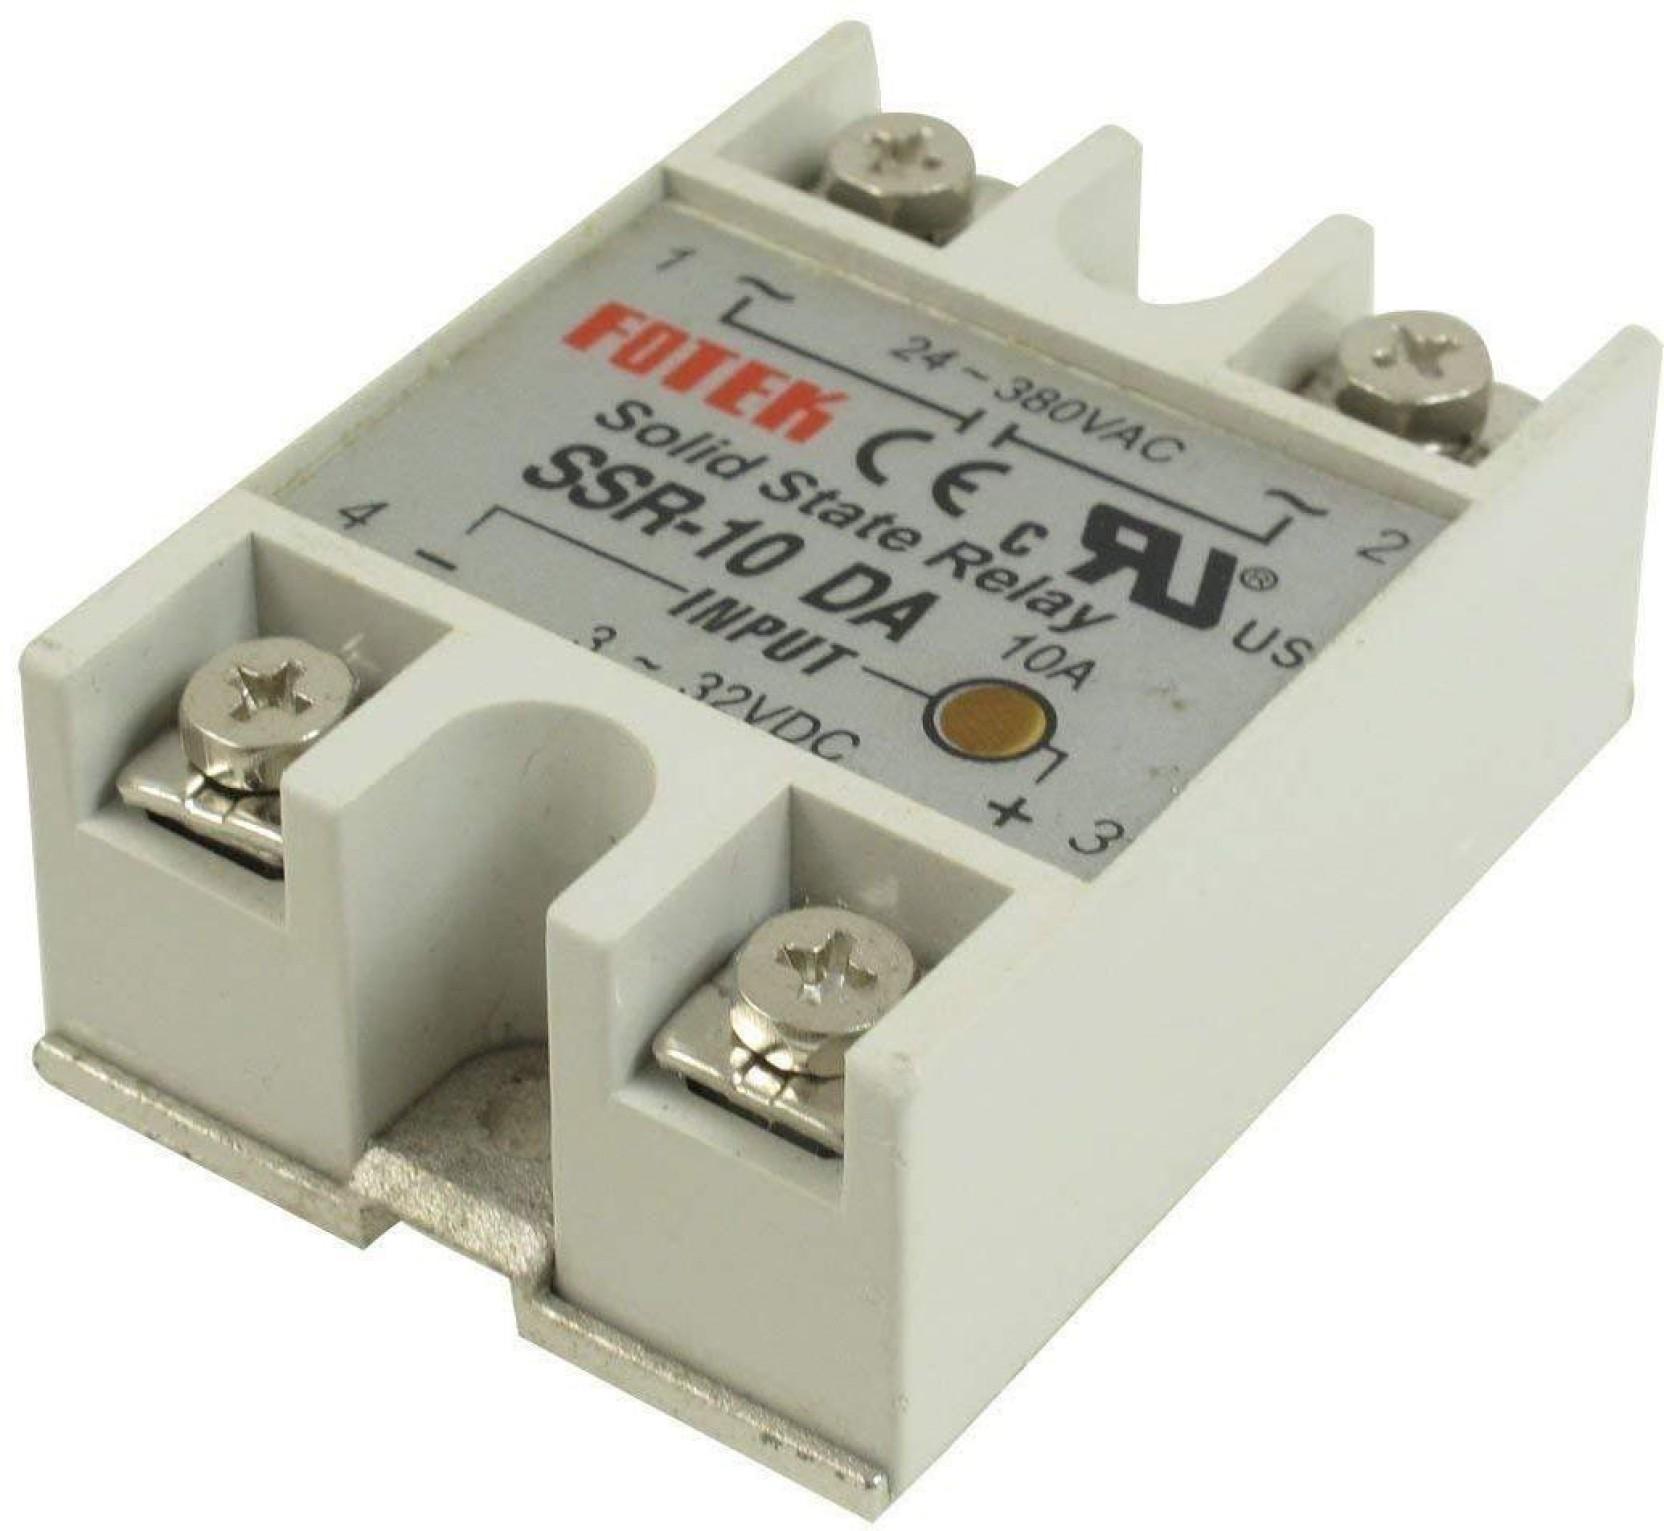 3-32V Dc To Ac 24V-380V 10A 250V SSR-10DA Solid State Relay Module